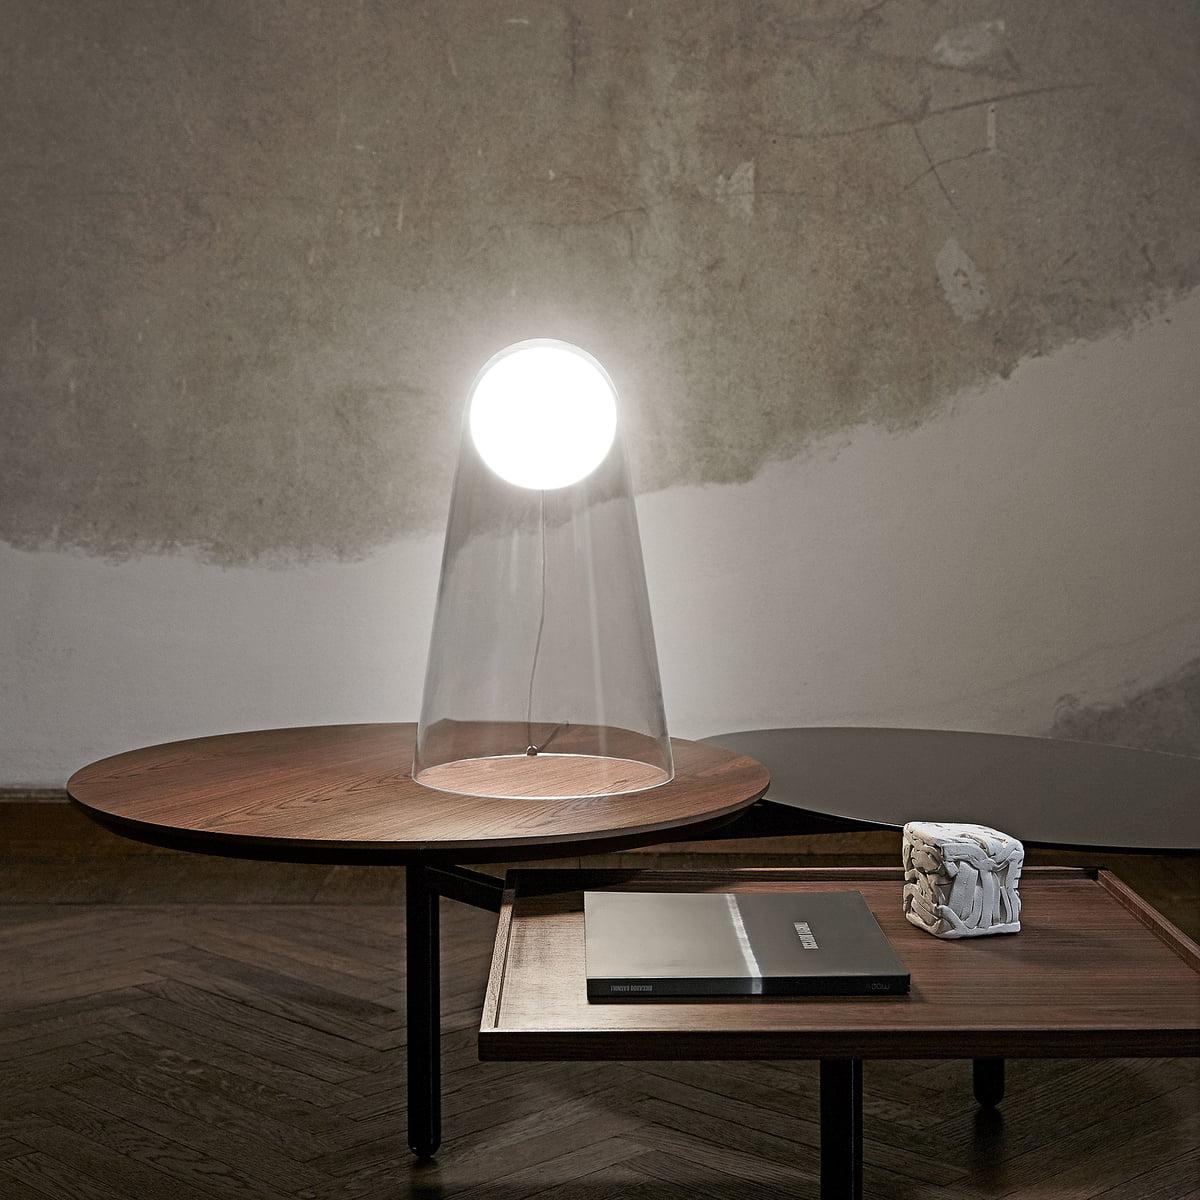 Lampe satellight par foscarini boutique for Foscarini leuchten gunstig